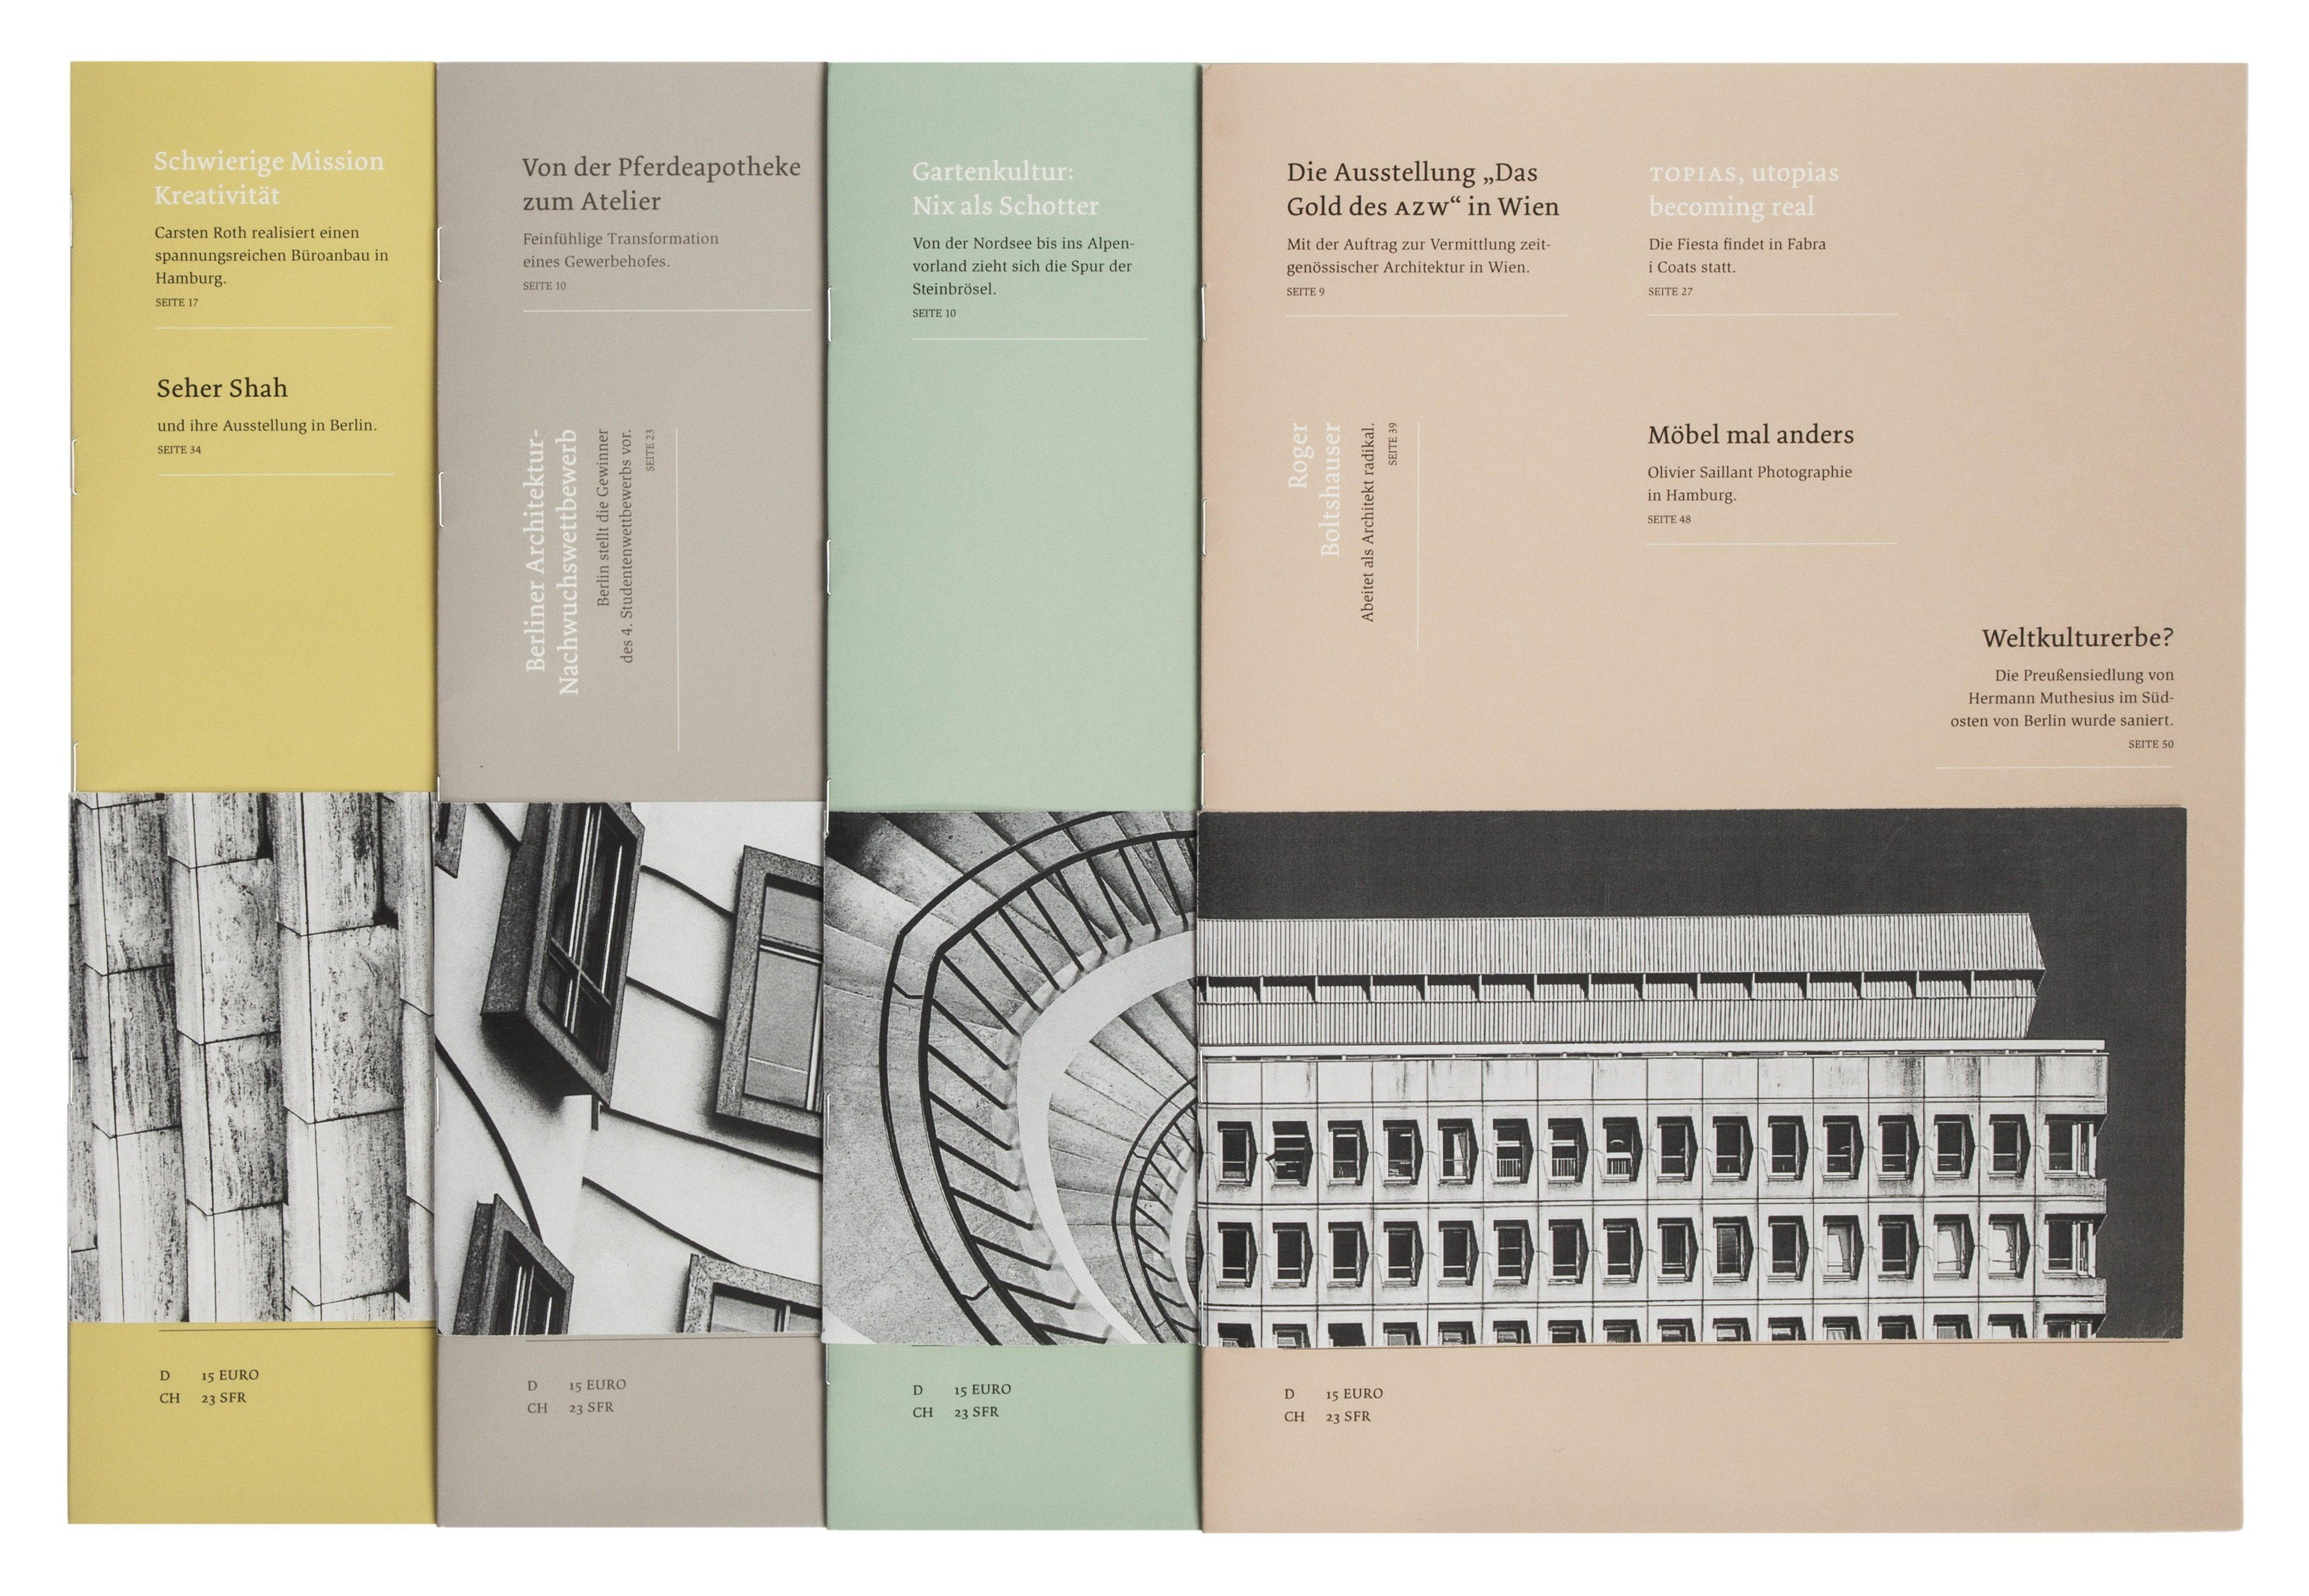 Architektur Magazin xtent ein architekturmagazin studio tūt